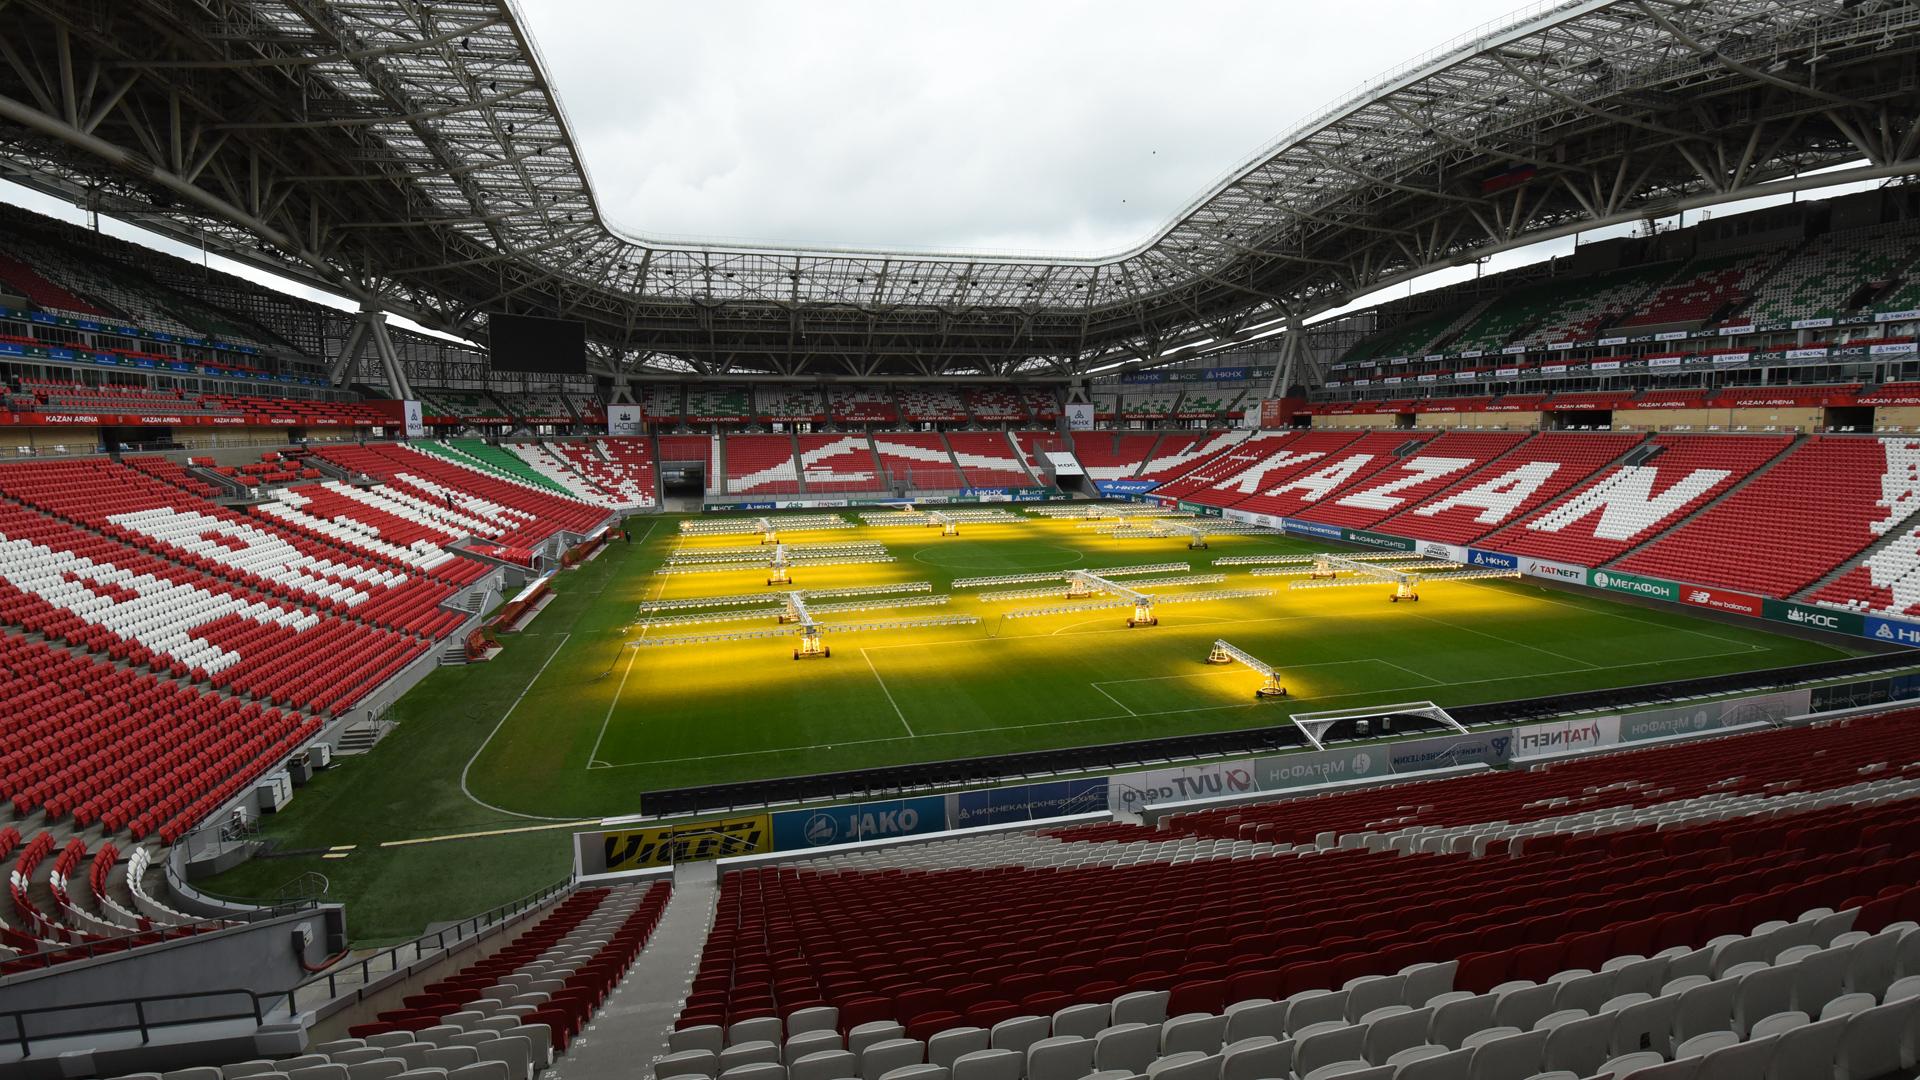 WM 2018 Russland Stadion Kazan